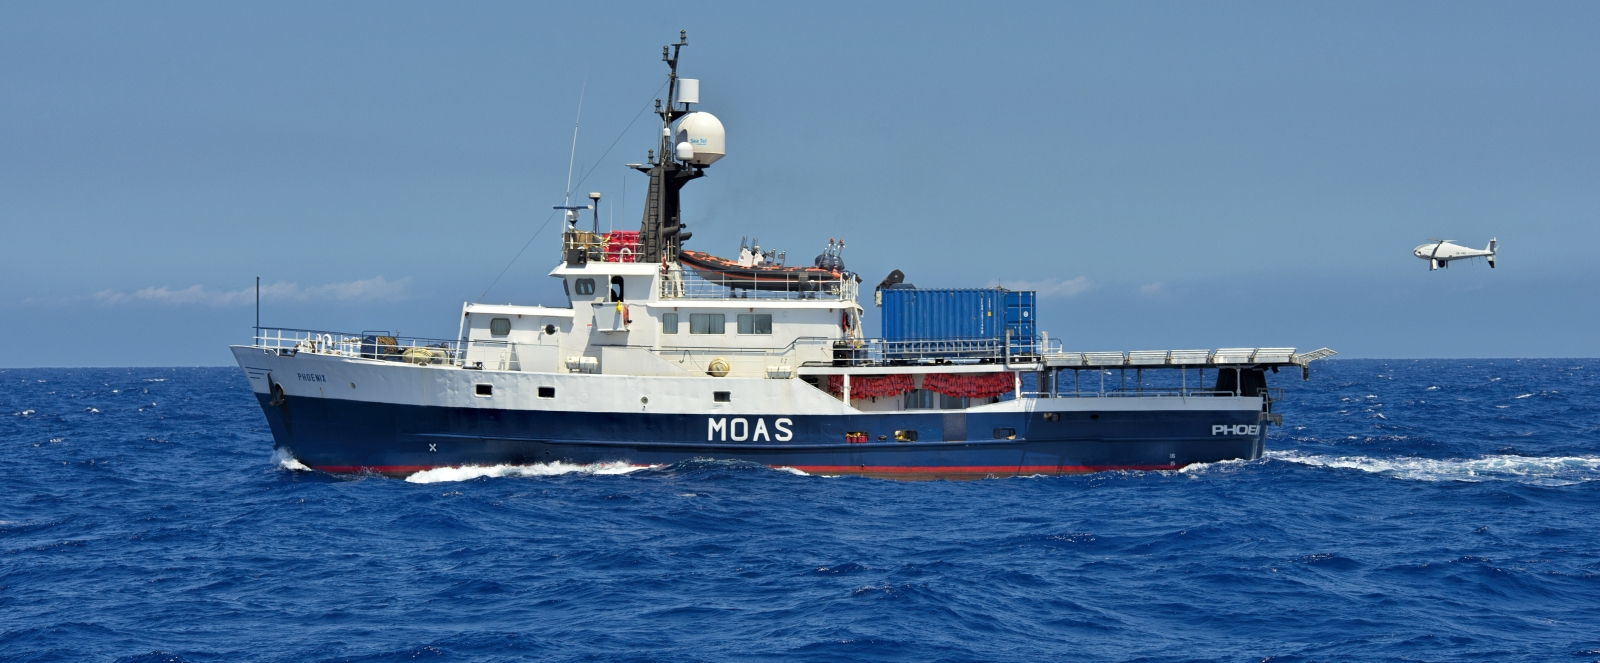 MOAS' MY Phoenix rescue ship